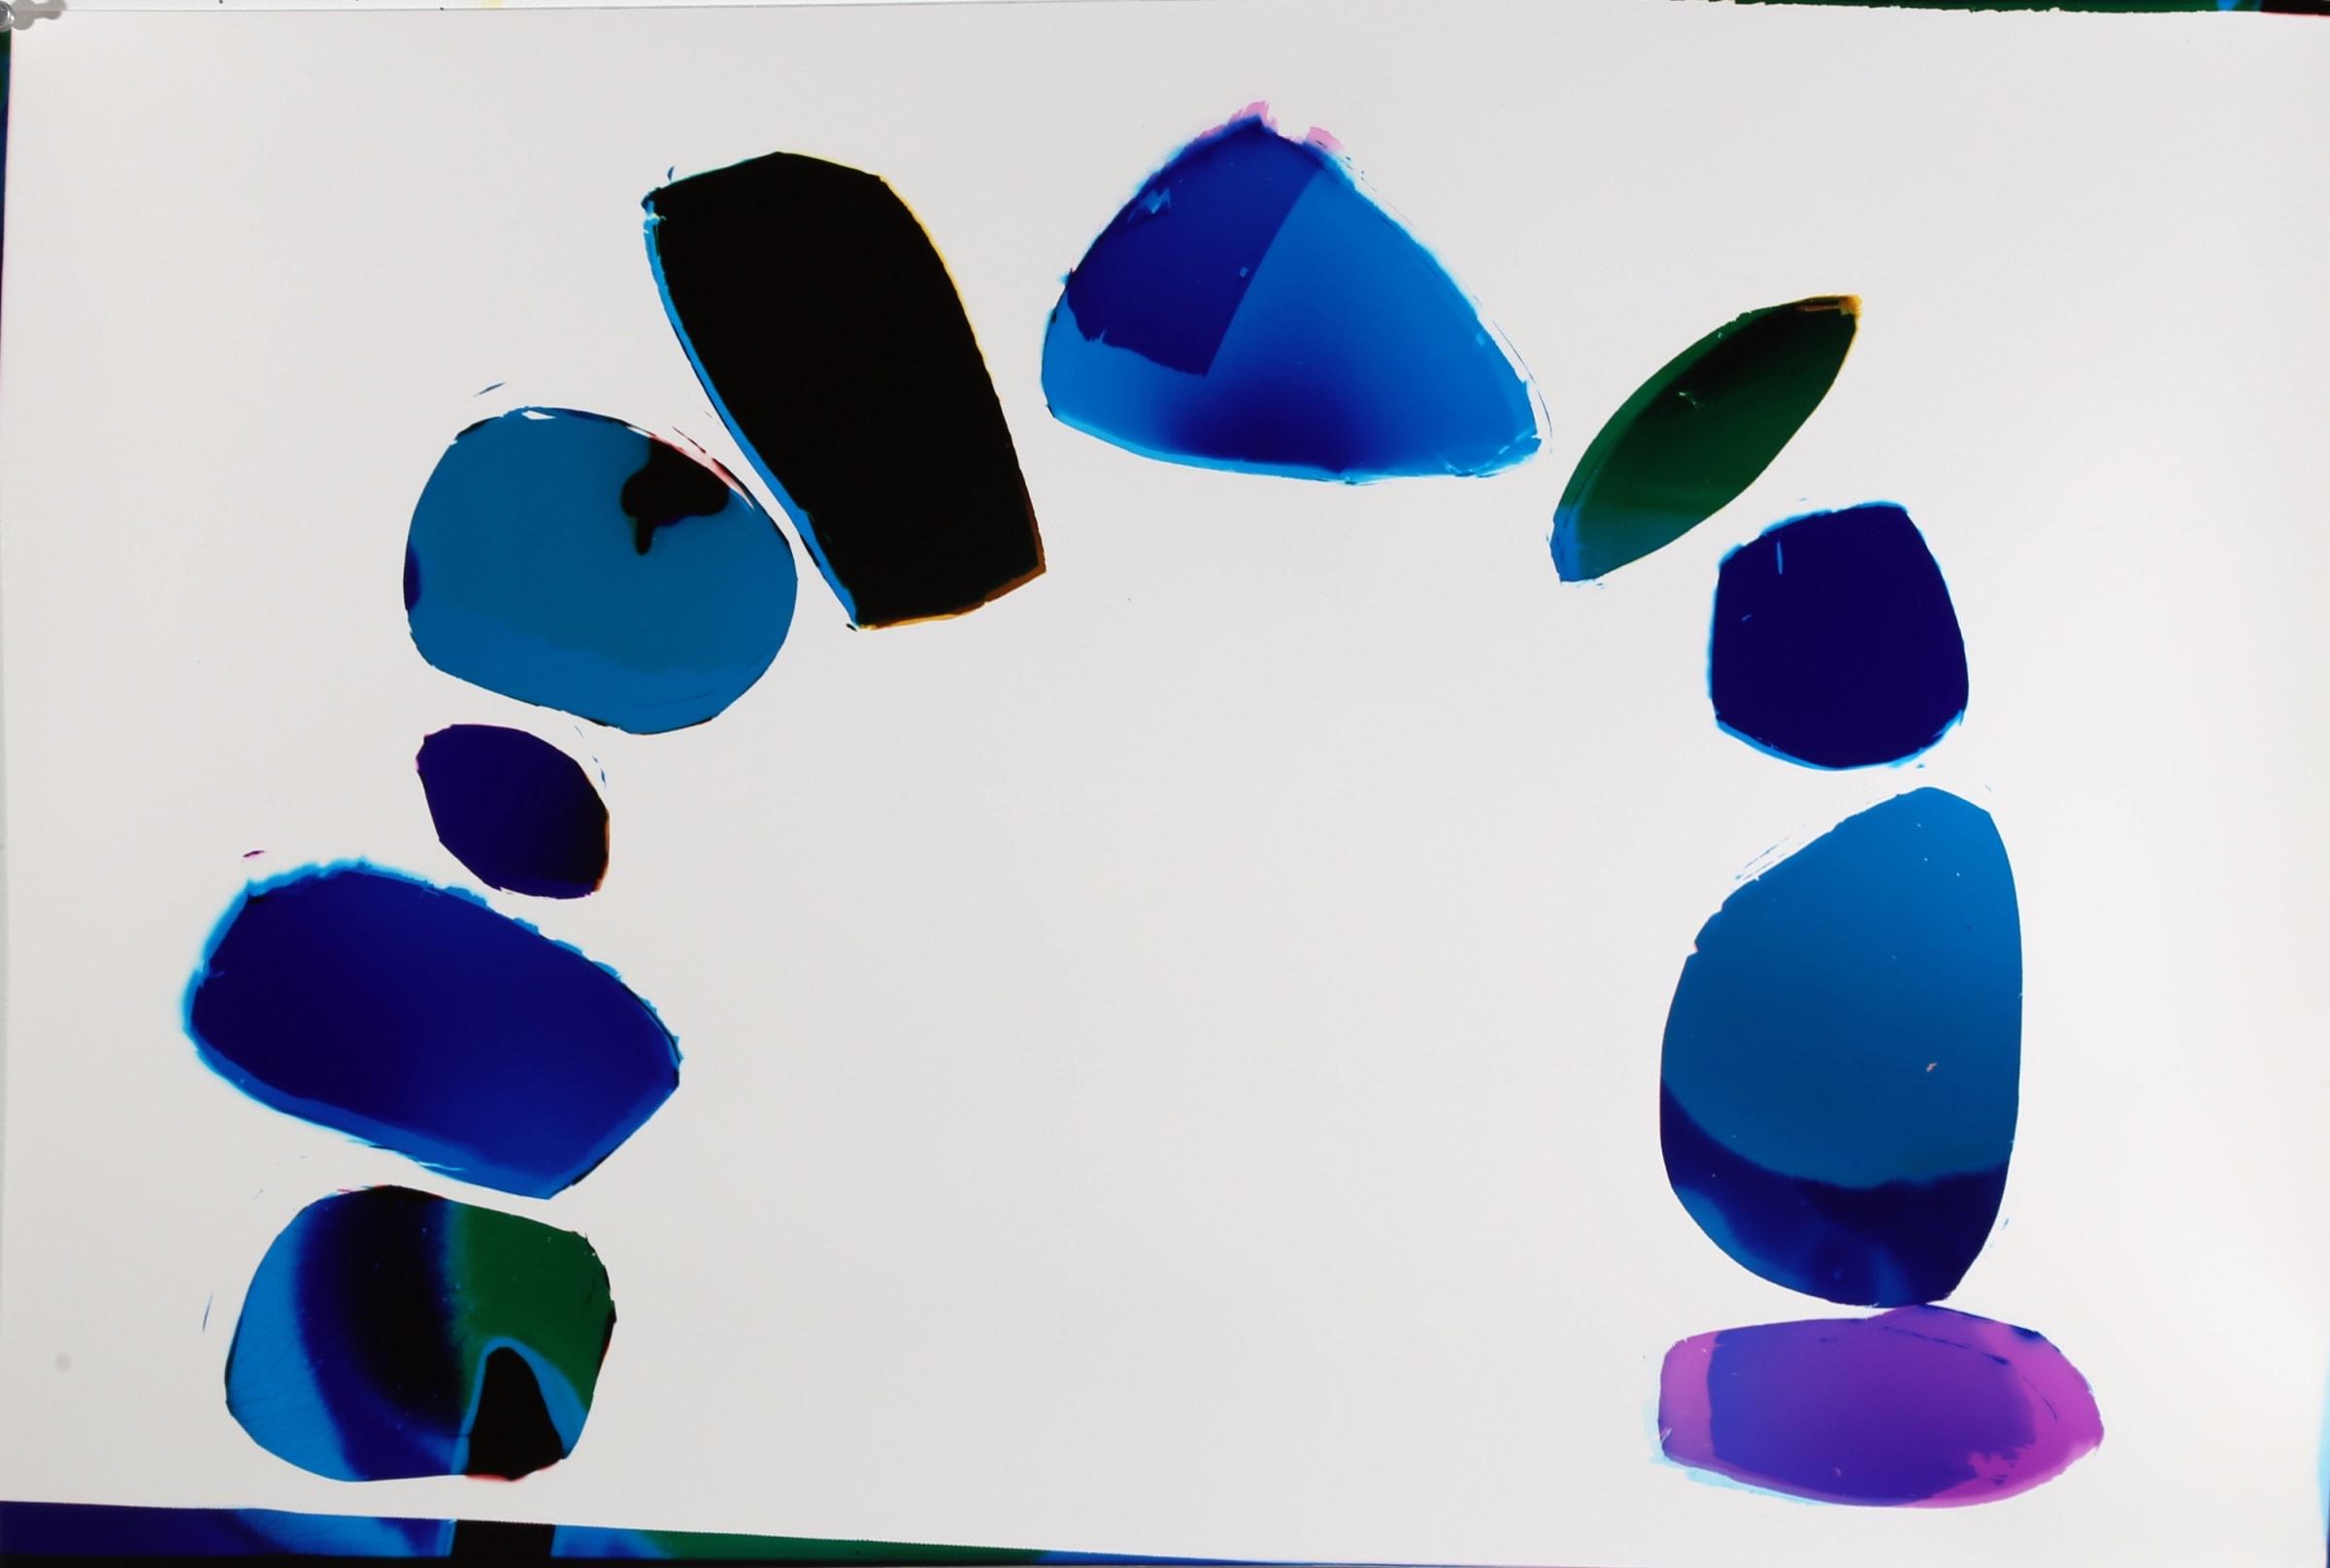 "<span class=""link fancybox-details-link""><a href=""/exhibitions/11/works/artworks127/"">View Detail Page</a></span><div class=""artist""><strong>Liz Nielsen</strong></div><div class=""title""><em>Water Stones</em>, 2018</div><div class=""signed_and_dated"">Signed, titled and dated on artist's label</div><div class=""medium"">Analogue Chromogenic Photogram on Fujiflex, Unique</div><div class=""dimensions"">50 x 74.3 cm<br>19 3/4 x 29 1/4 in</div>"